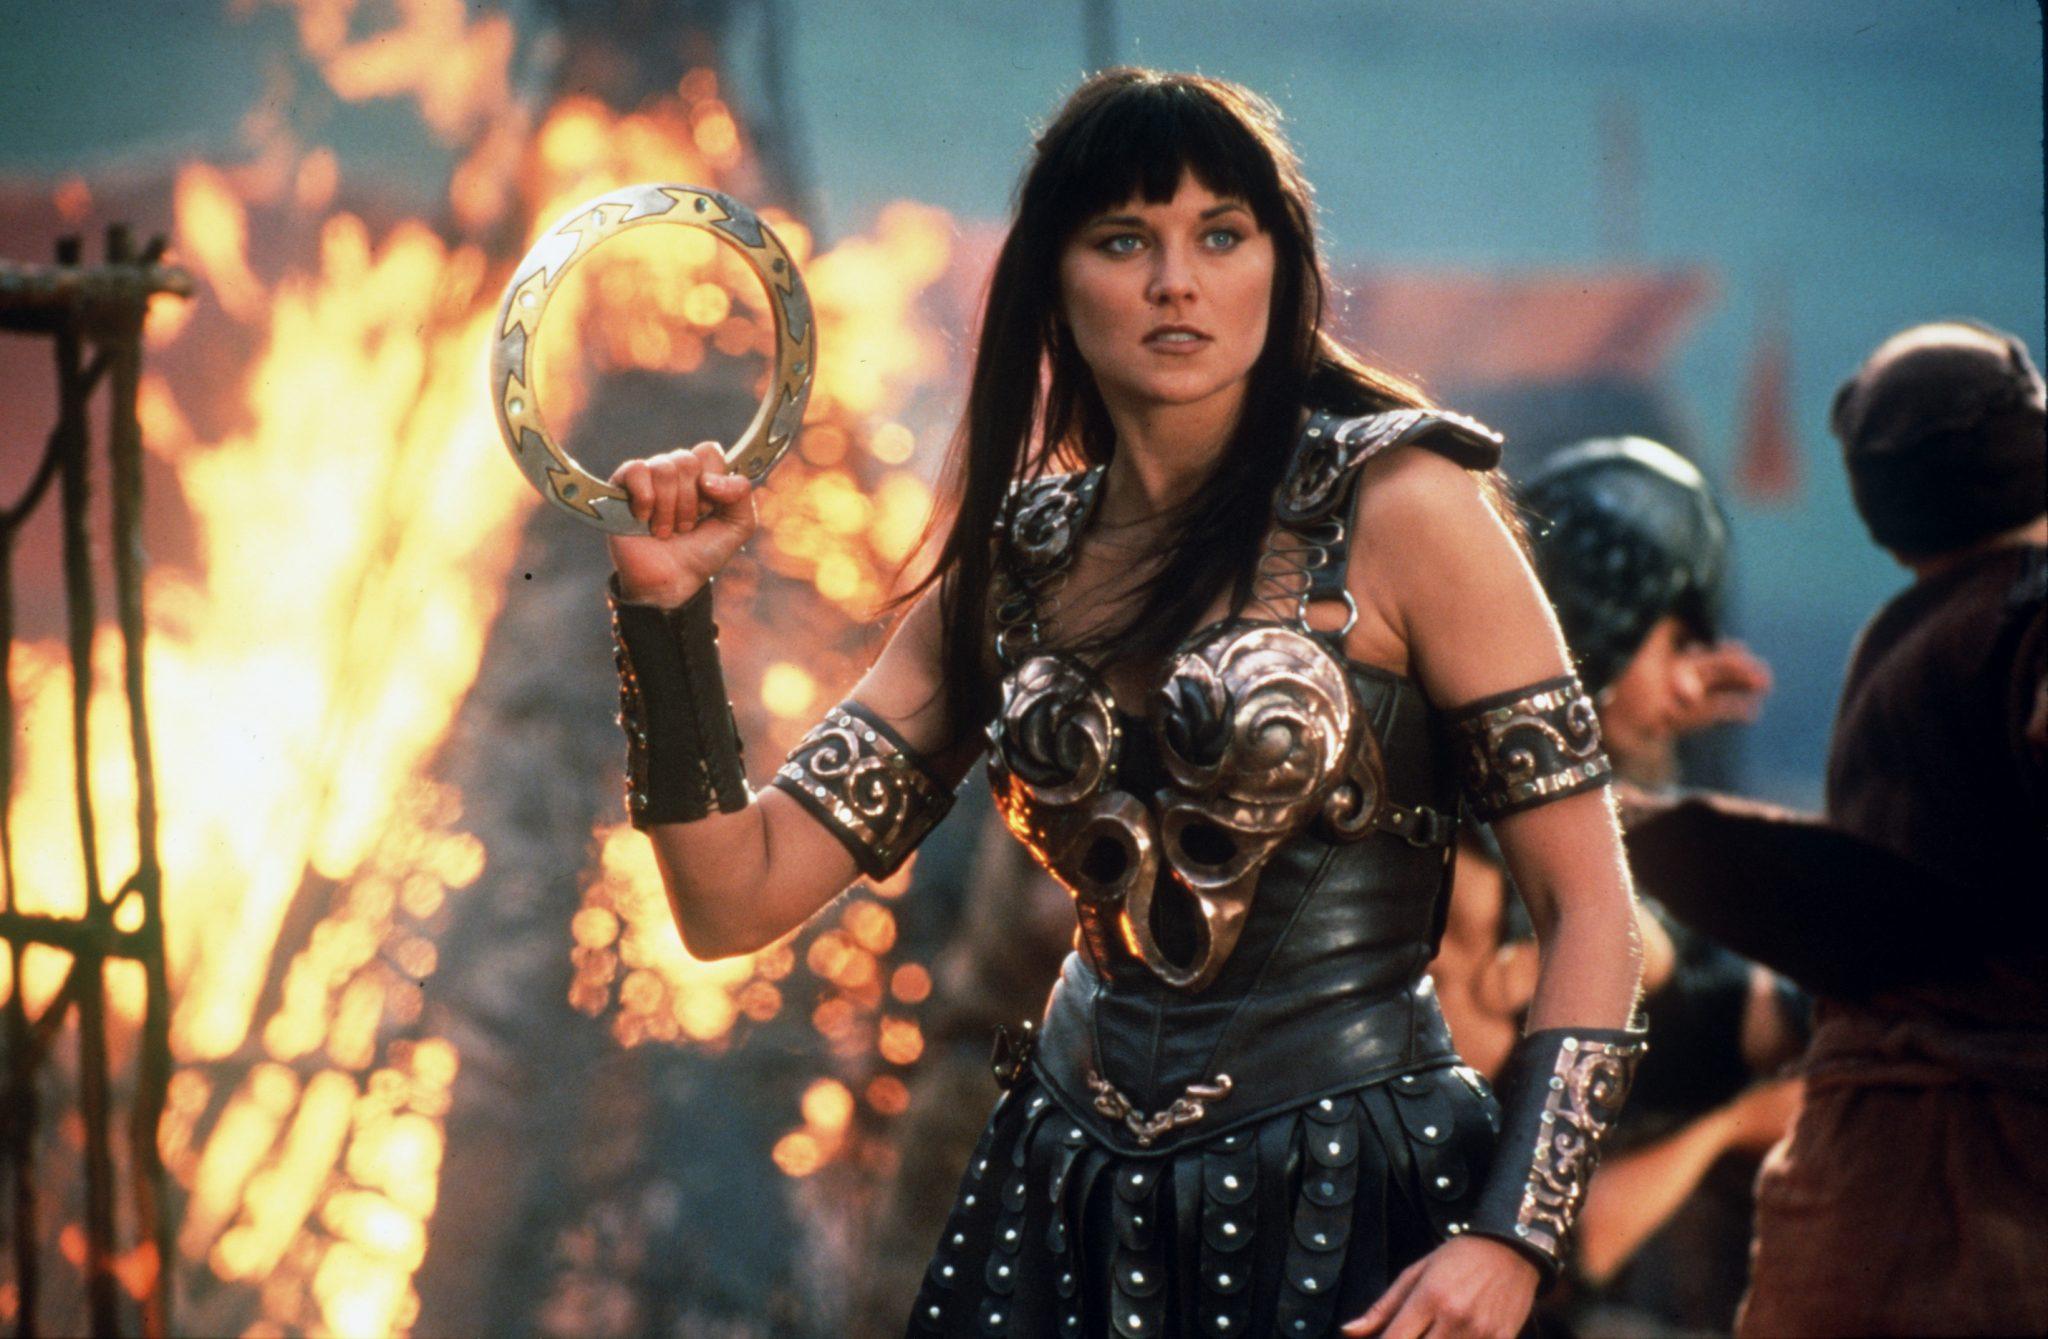 072015-xena-warrior-princess